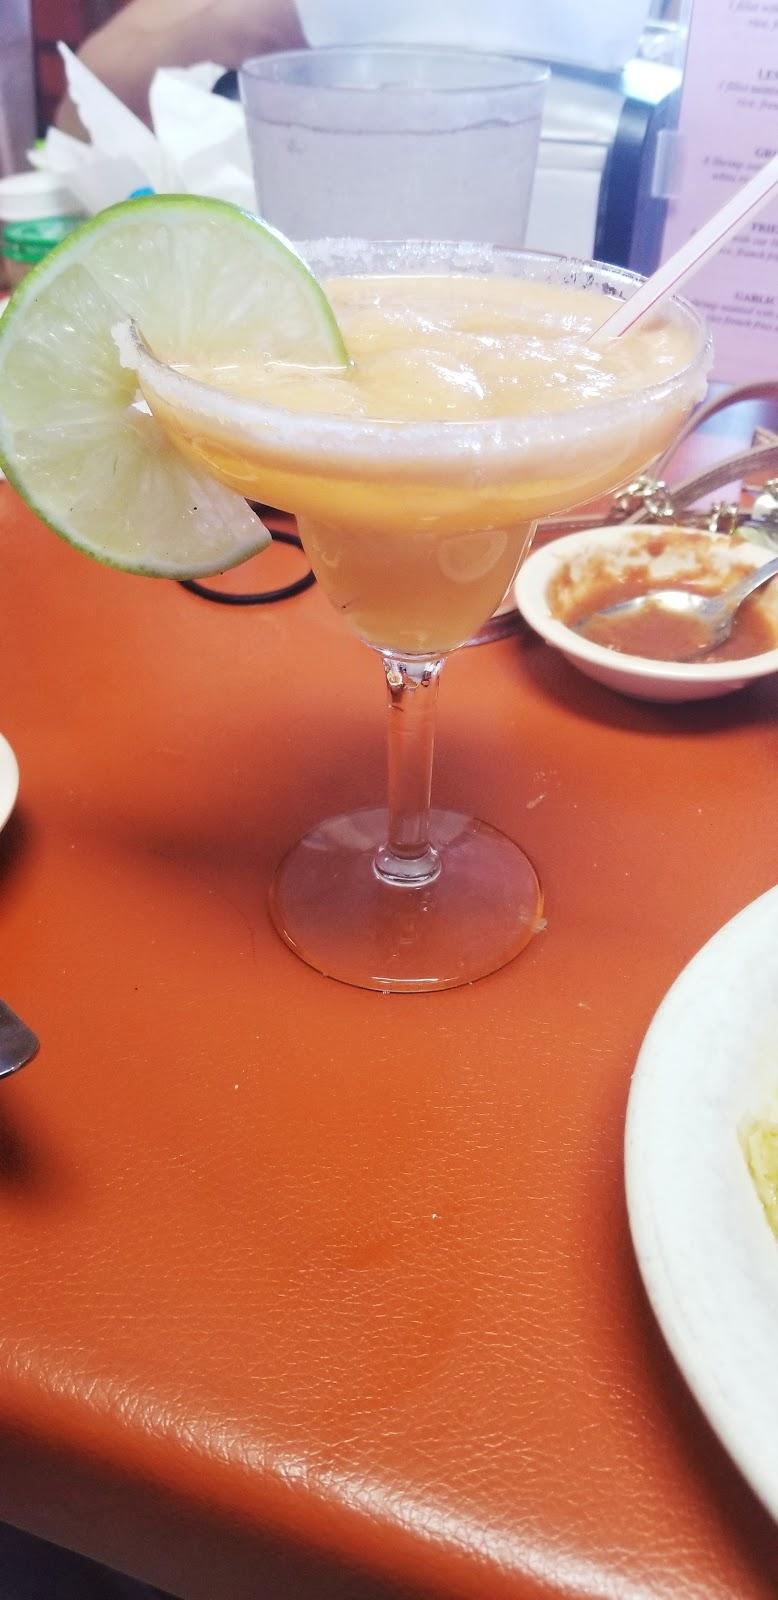 El Corral Tex-Mex Restaurant - restaurant  | Photo 10 of 10 | Address: 1415 N 14th St, Kingsville, TX 78363, USA | Phone: (361) 592-1574